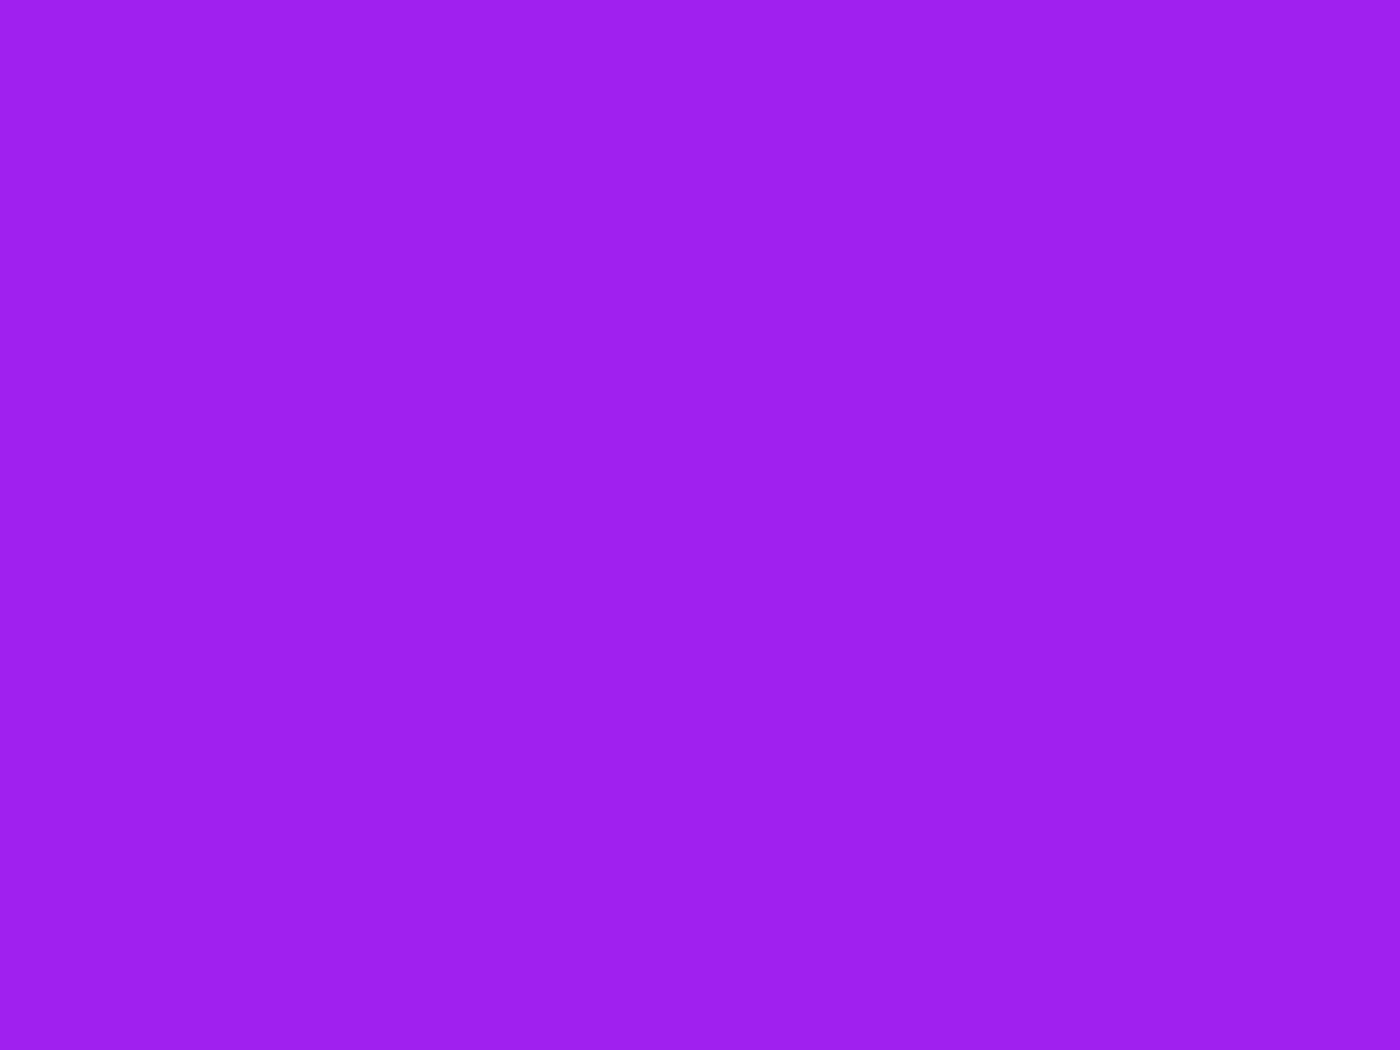 1400x1050 Purple X11 Gui Solid Color Background